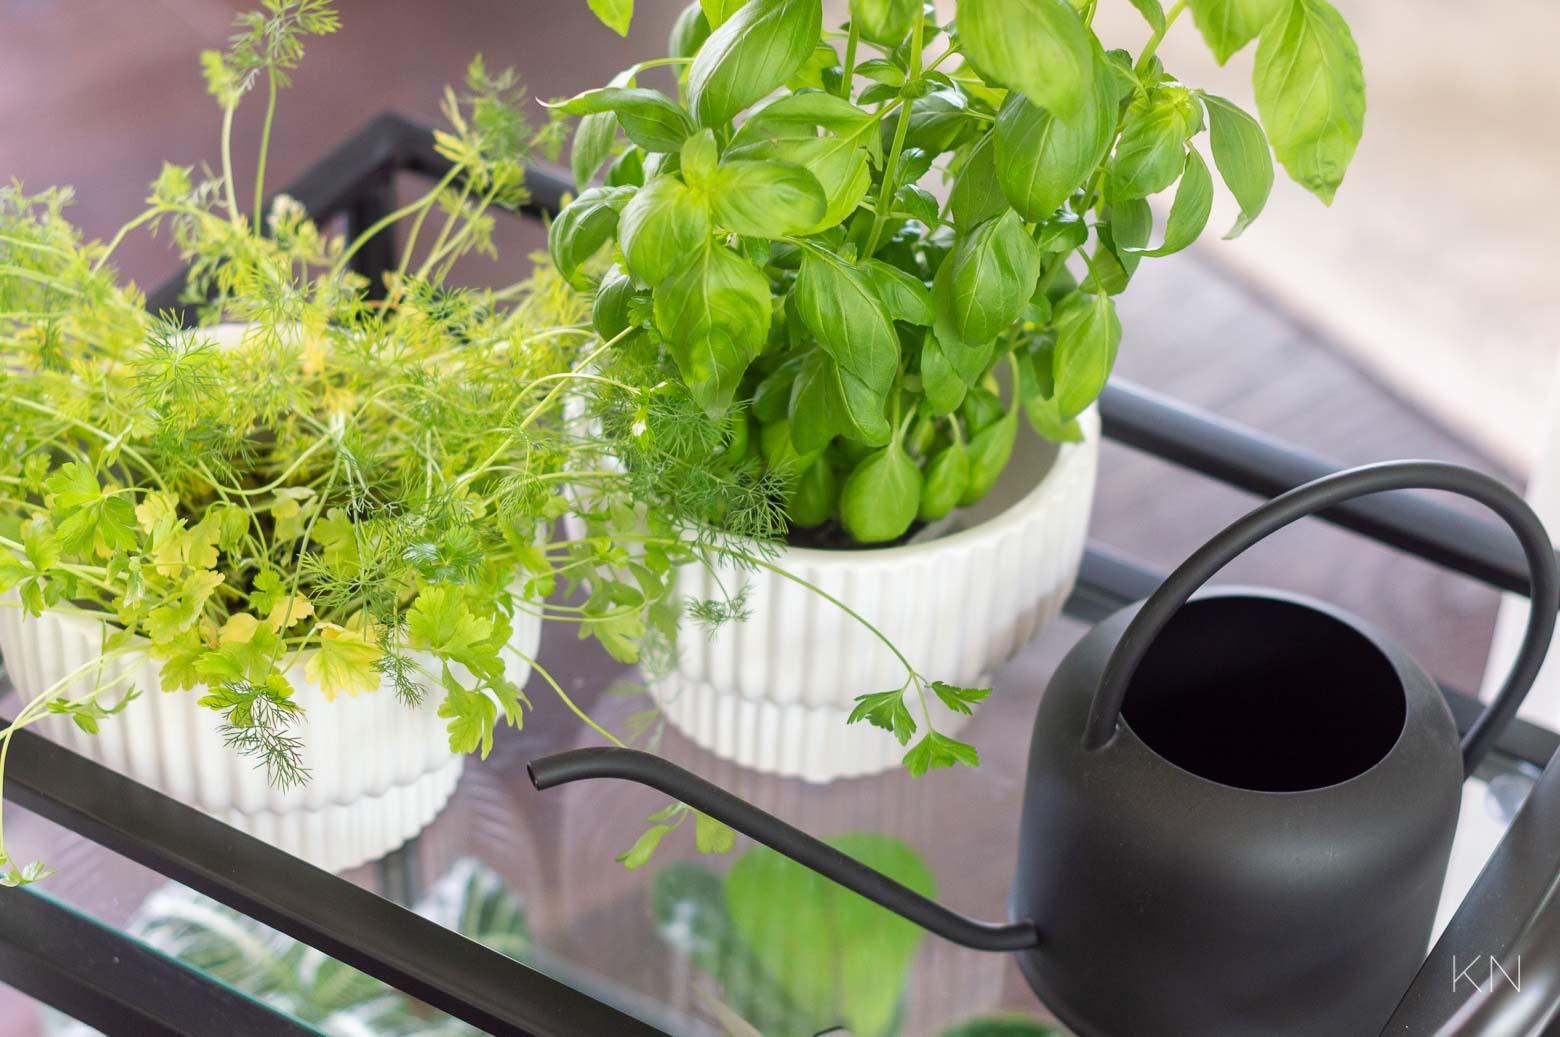 Bar Cart Herb Garden (& Tons of Other Ways to Use Bar Carts Around Your Home)